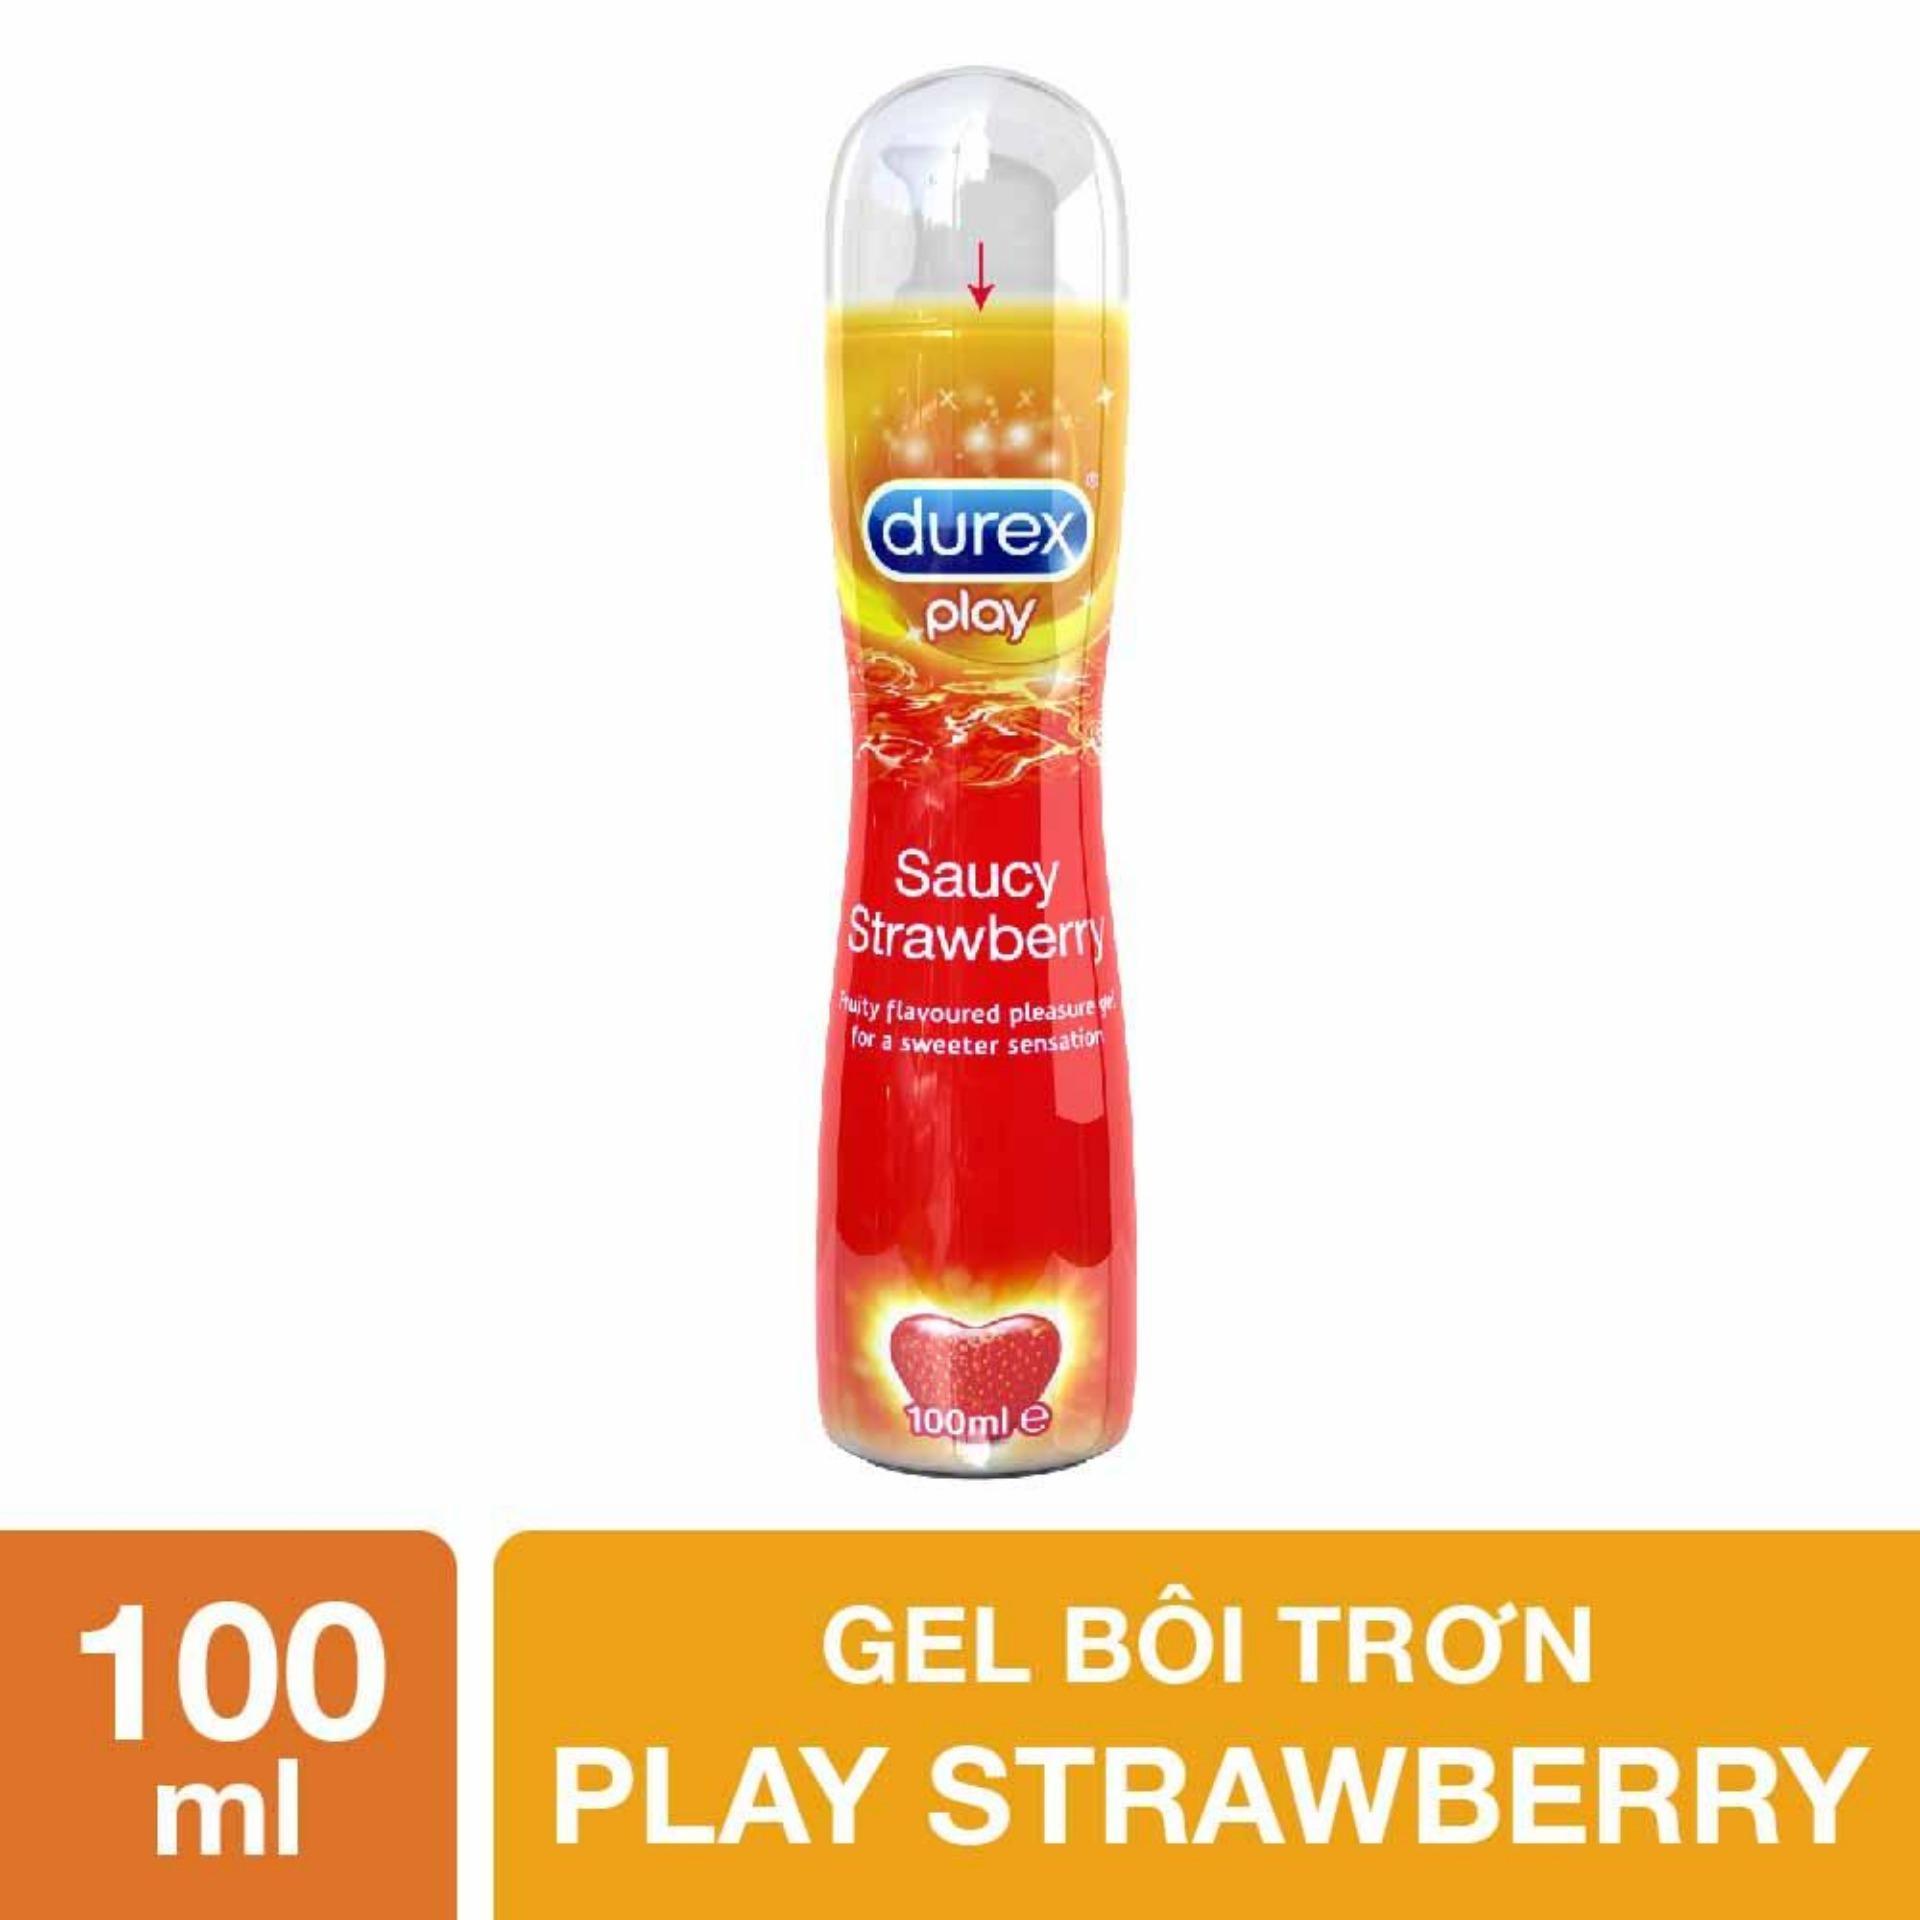 Hình ảnh Gel bôi trơn Durex Play Strawberry 100ml